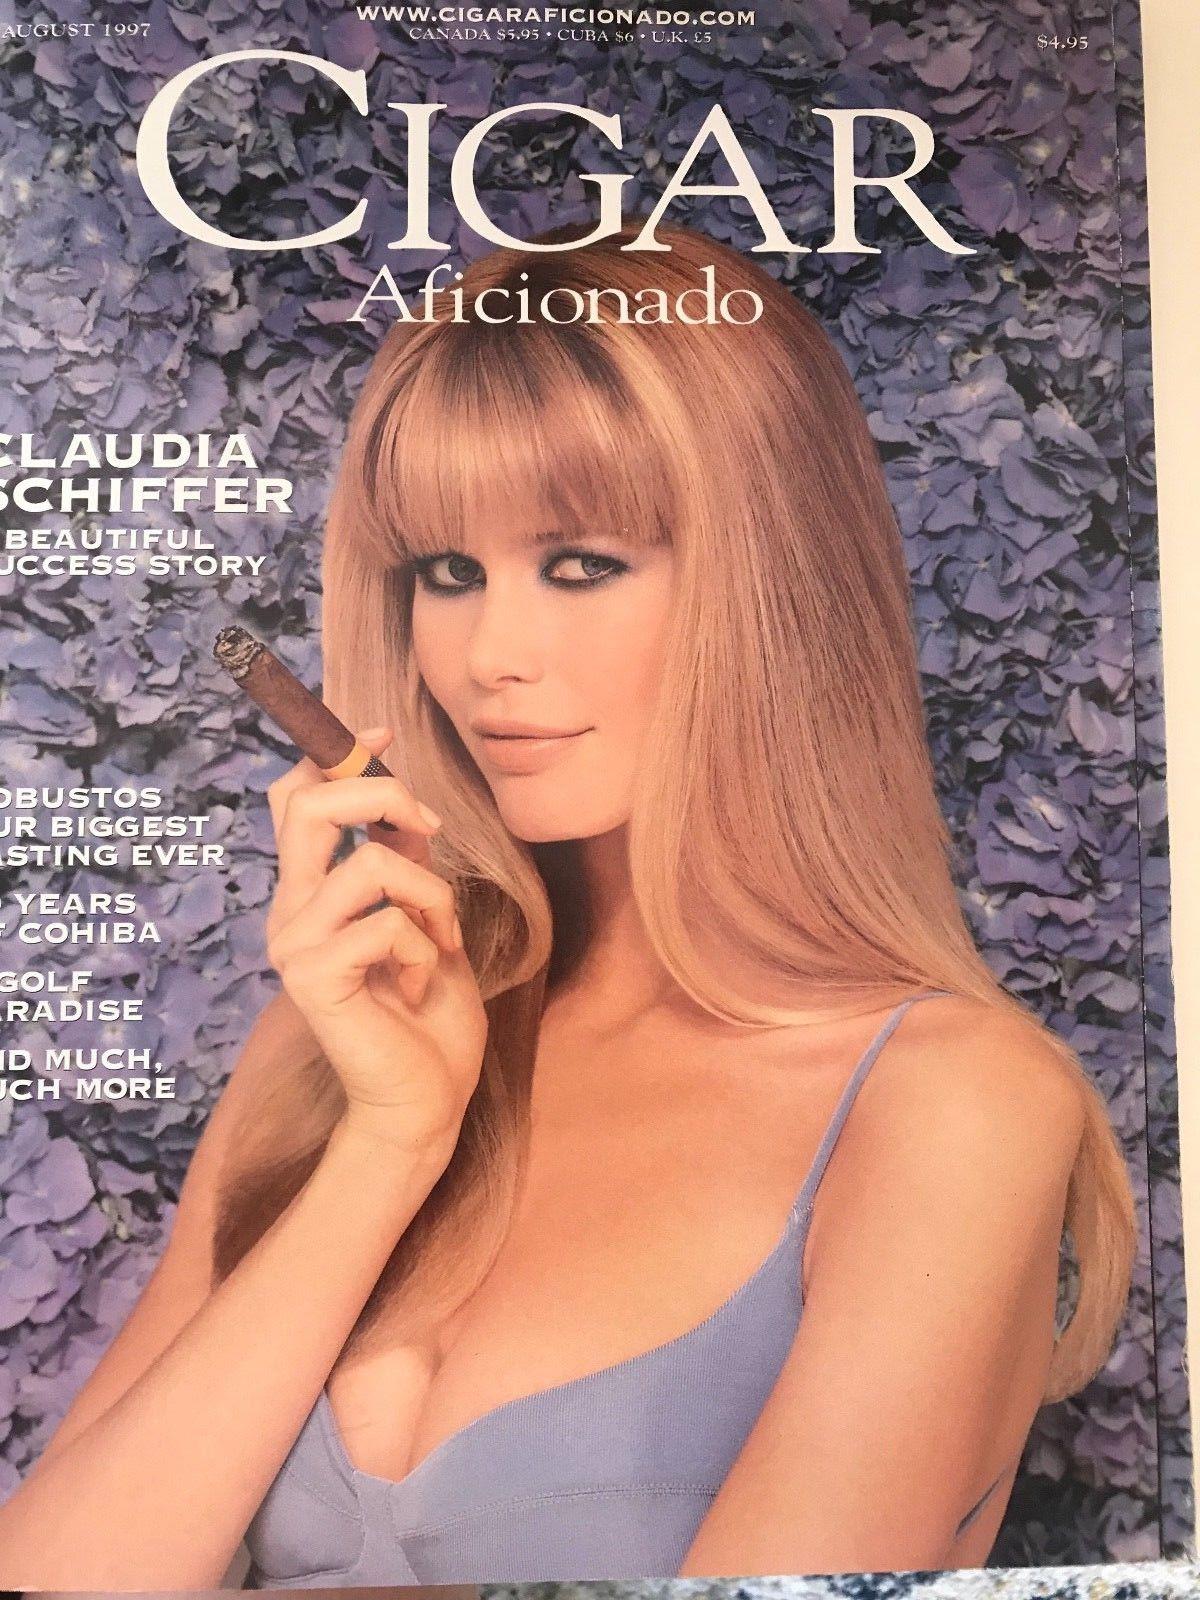 august-1997-cigar-aficionado-claudia-schiffer.jpg